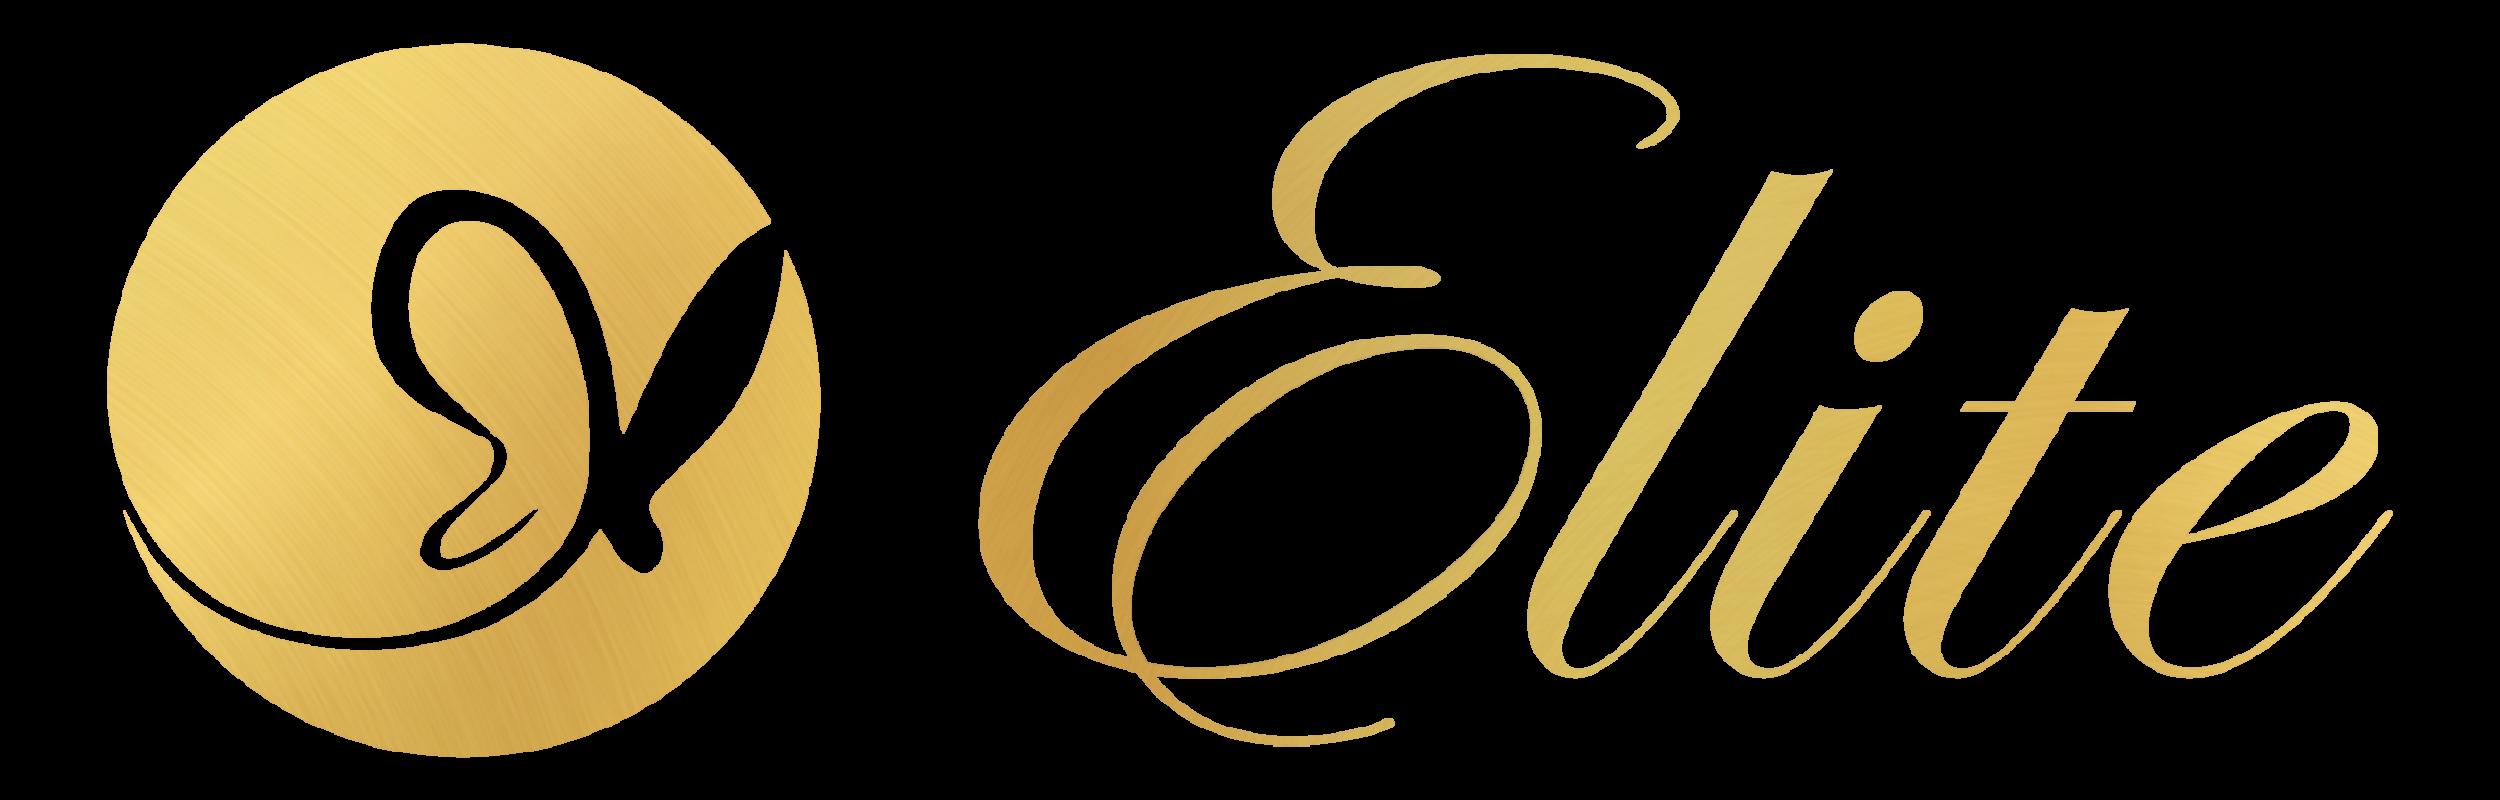 elite logo (elite + butterfly)